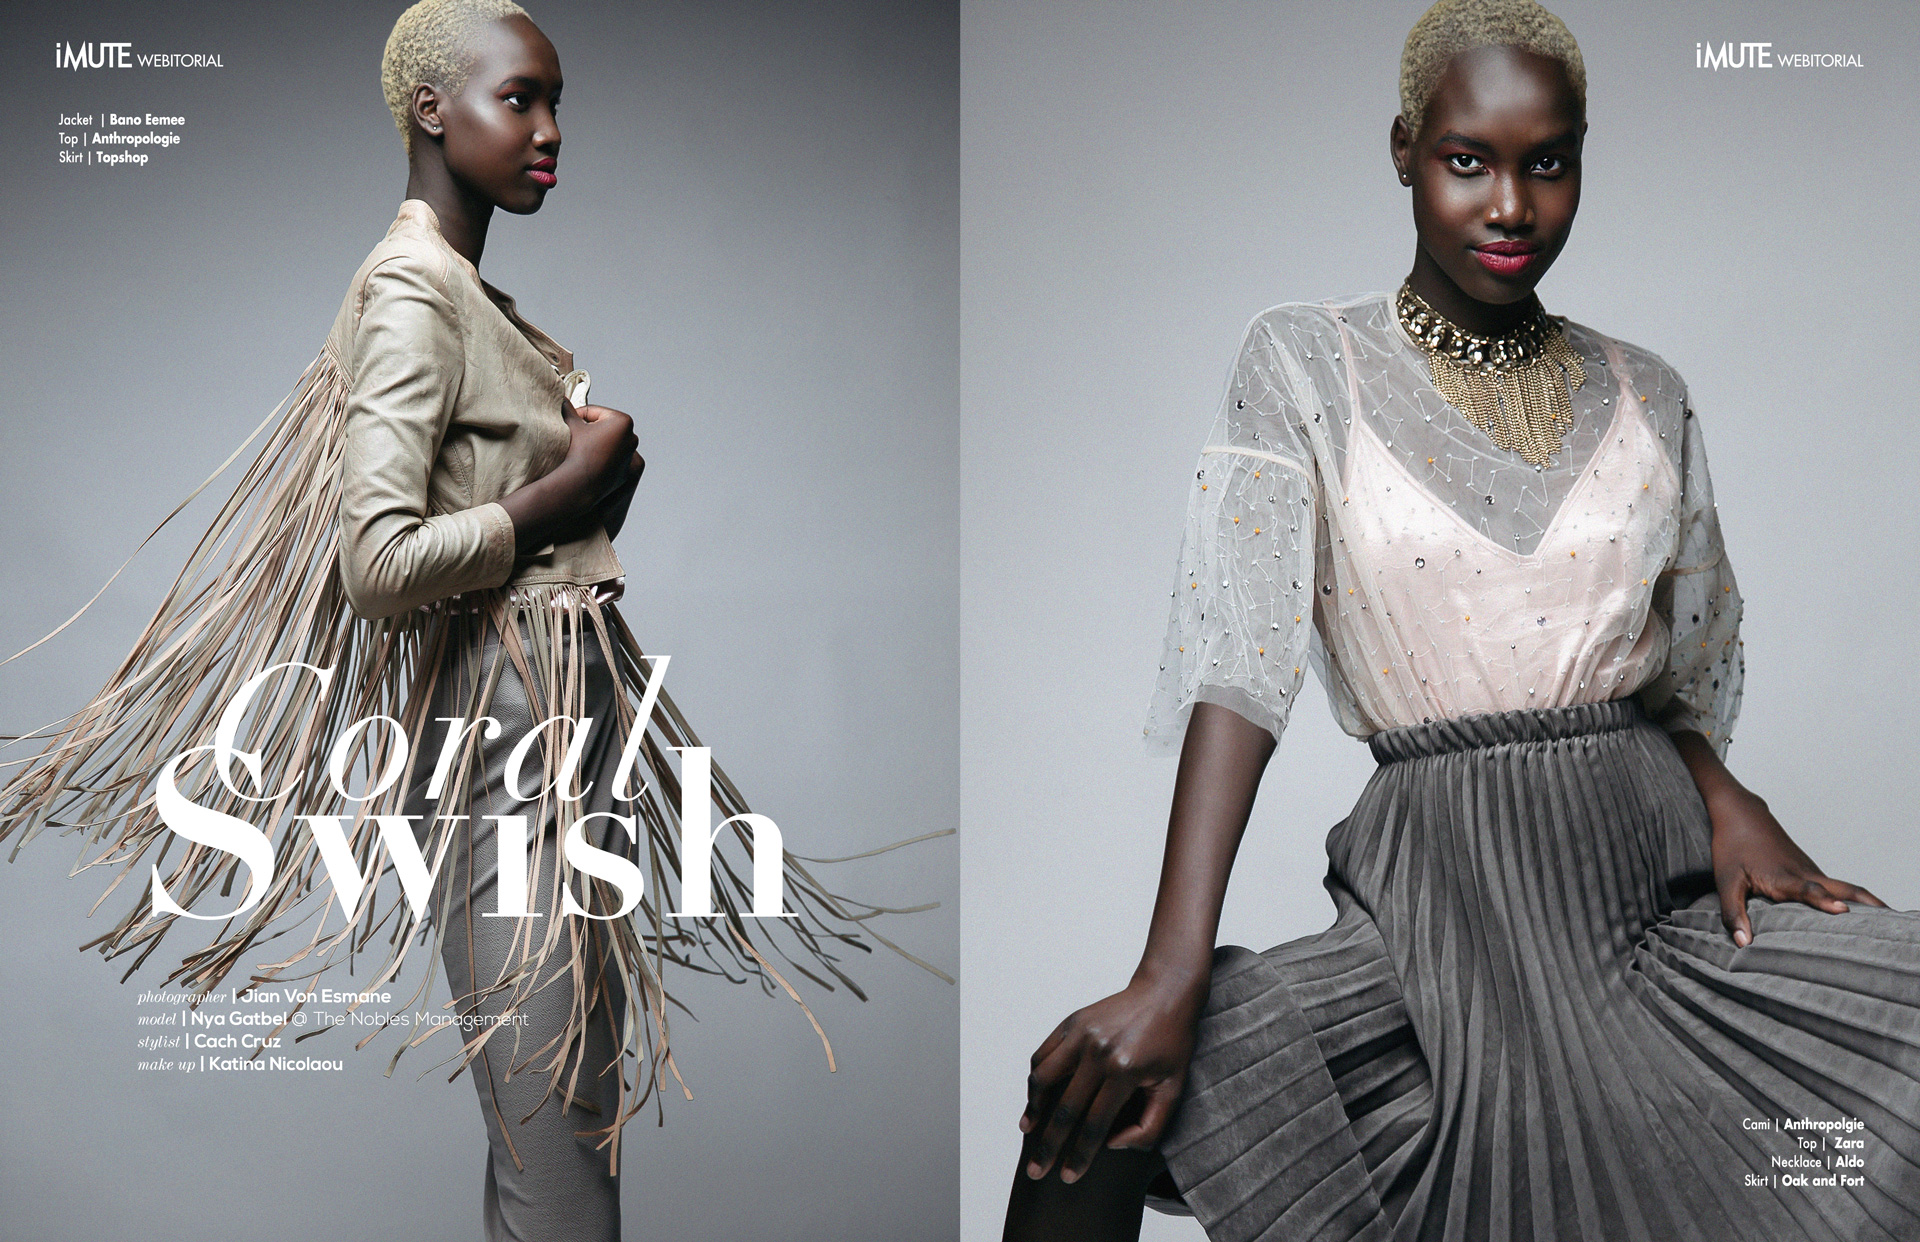 Coral Swish webitorial for iMute Magazine Photographer Jian Von Esmane Model  Nya Gatbel @The Nobles Management Stylist  Cach Cruz Makeup  Katina Nicolaou